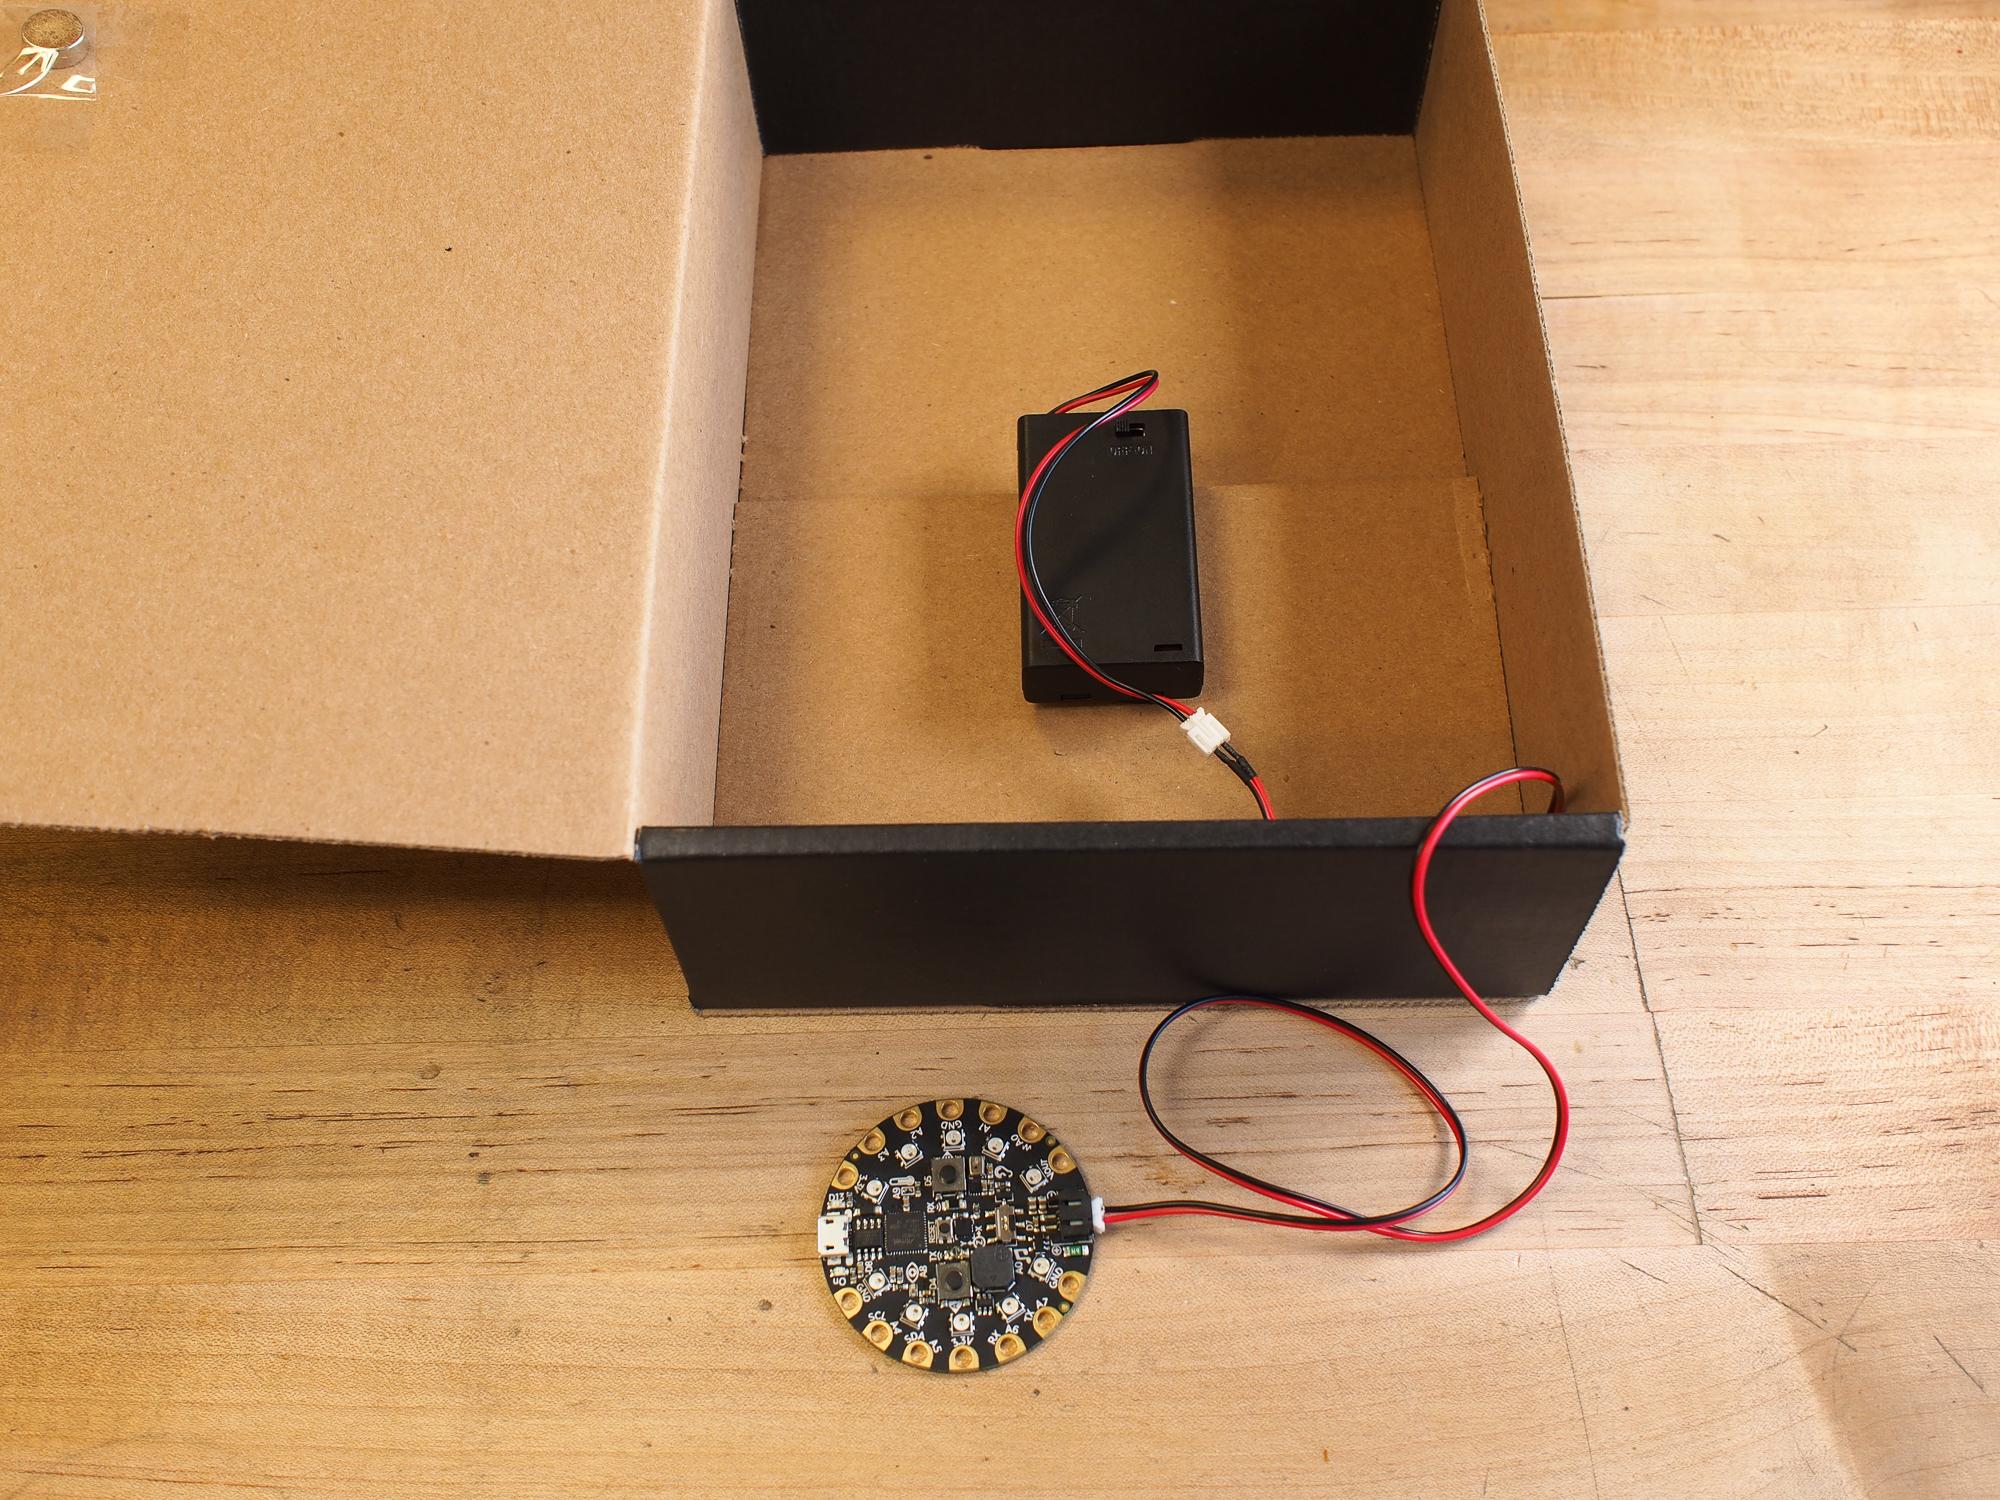 circuitpython_PC080437_2k.jpg